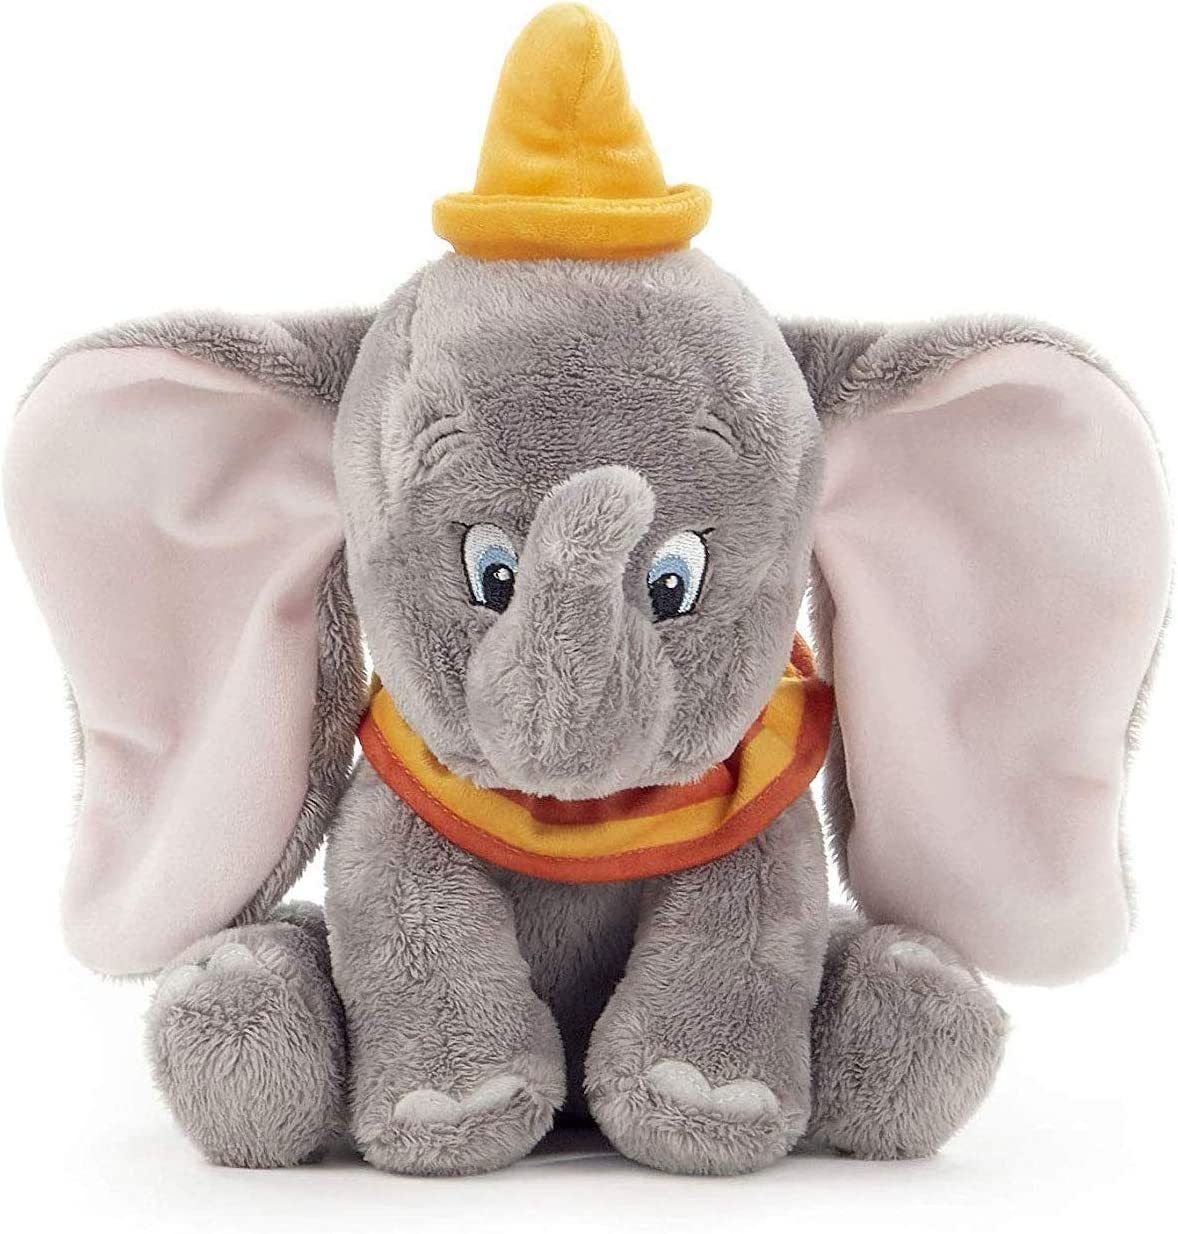 Dumbo - Peluche Elefante 11'81